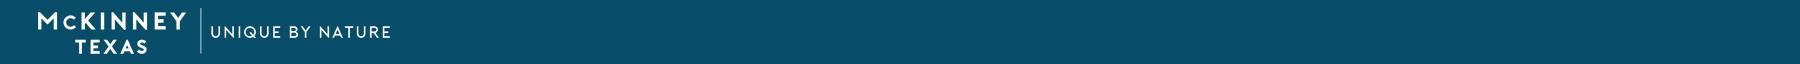 McKinney, TX logo